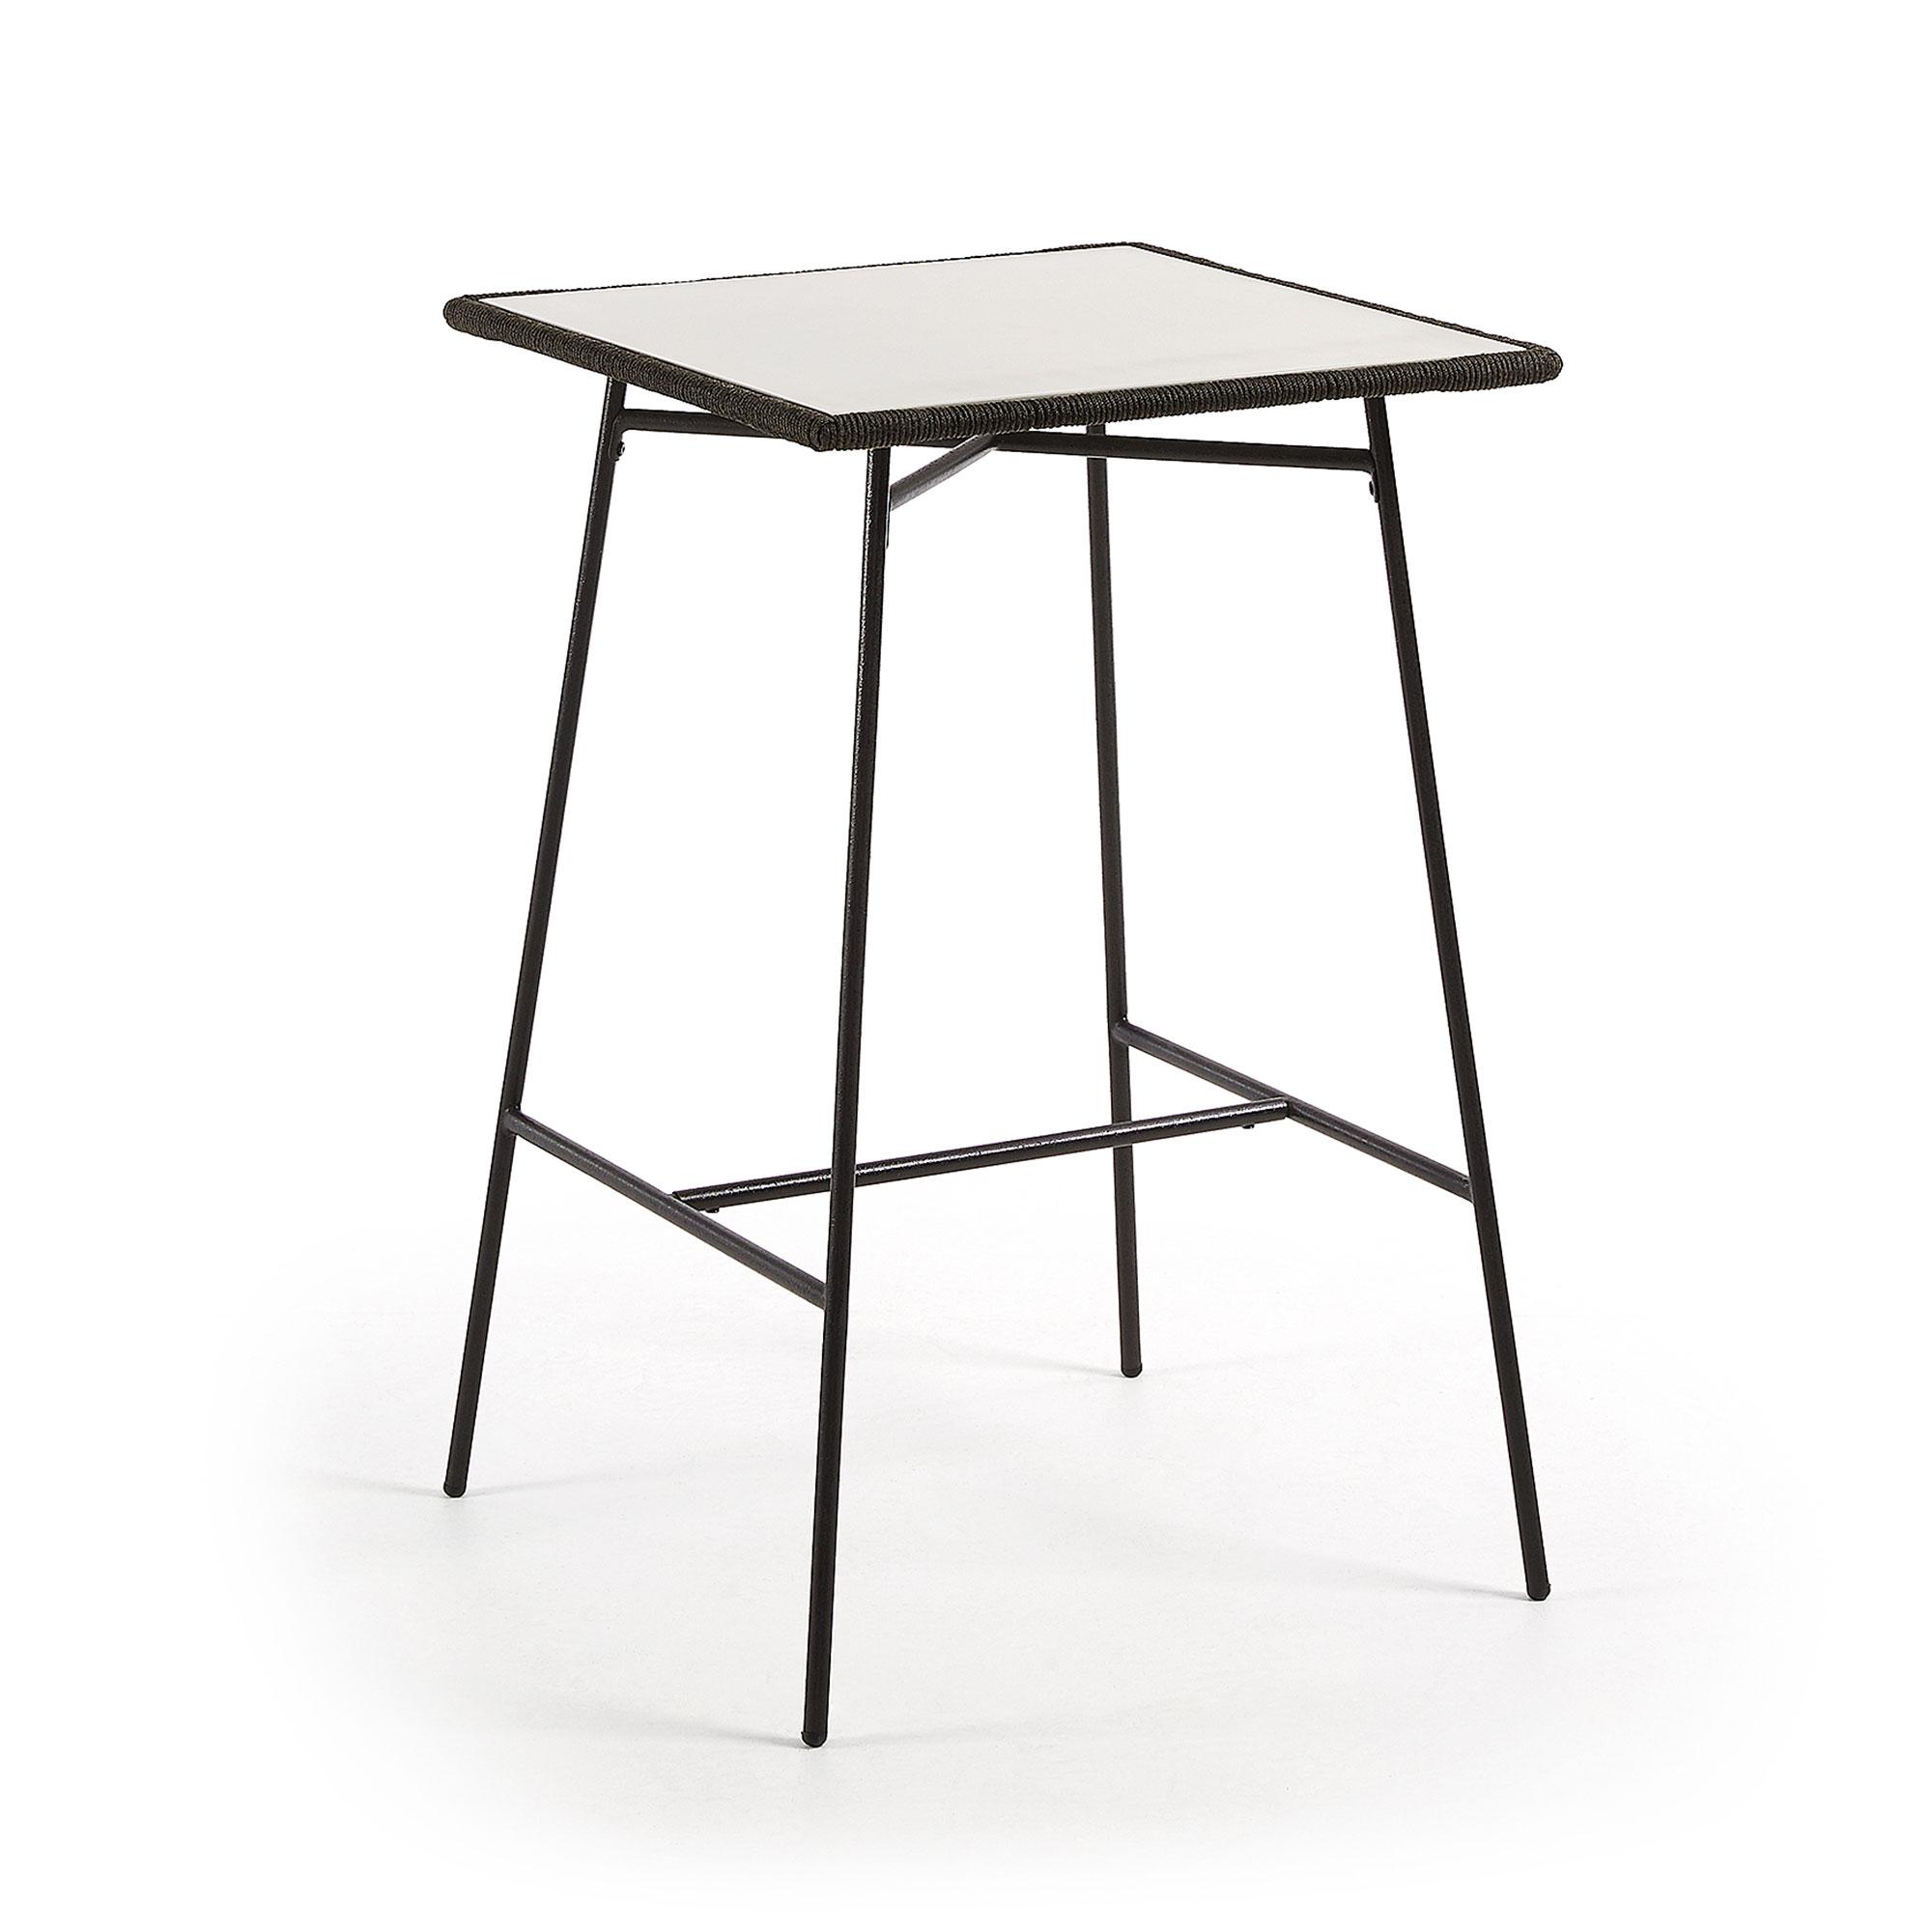 laforma – Laforma freeman caf?bord - lysegrå/grå polycement/stål, høj, kvadratisk (70x70) fra boboonline.dk